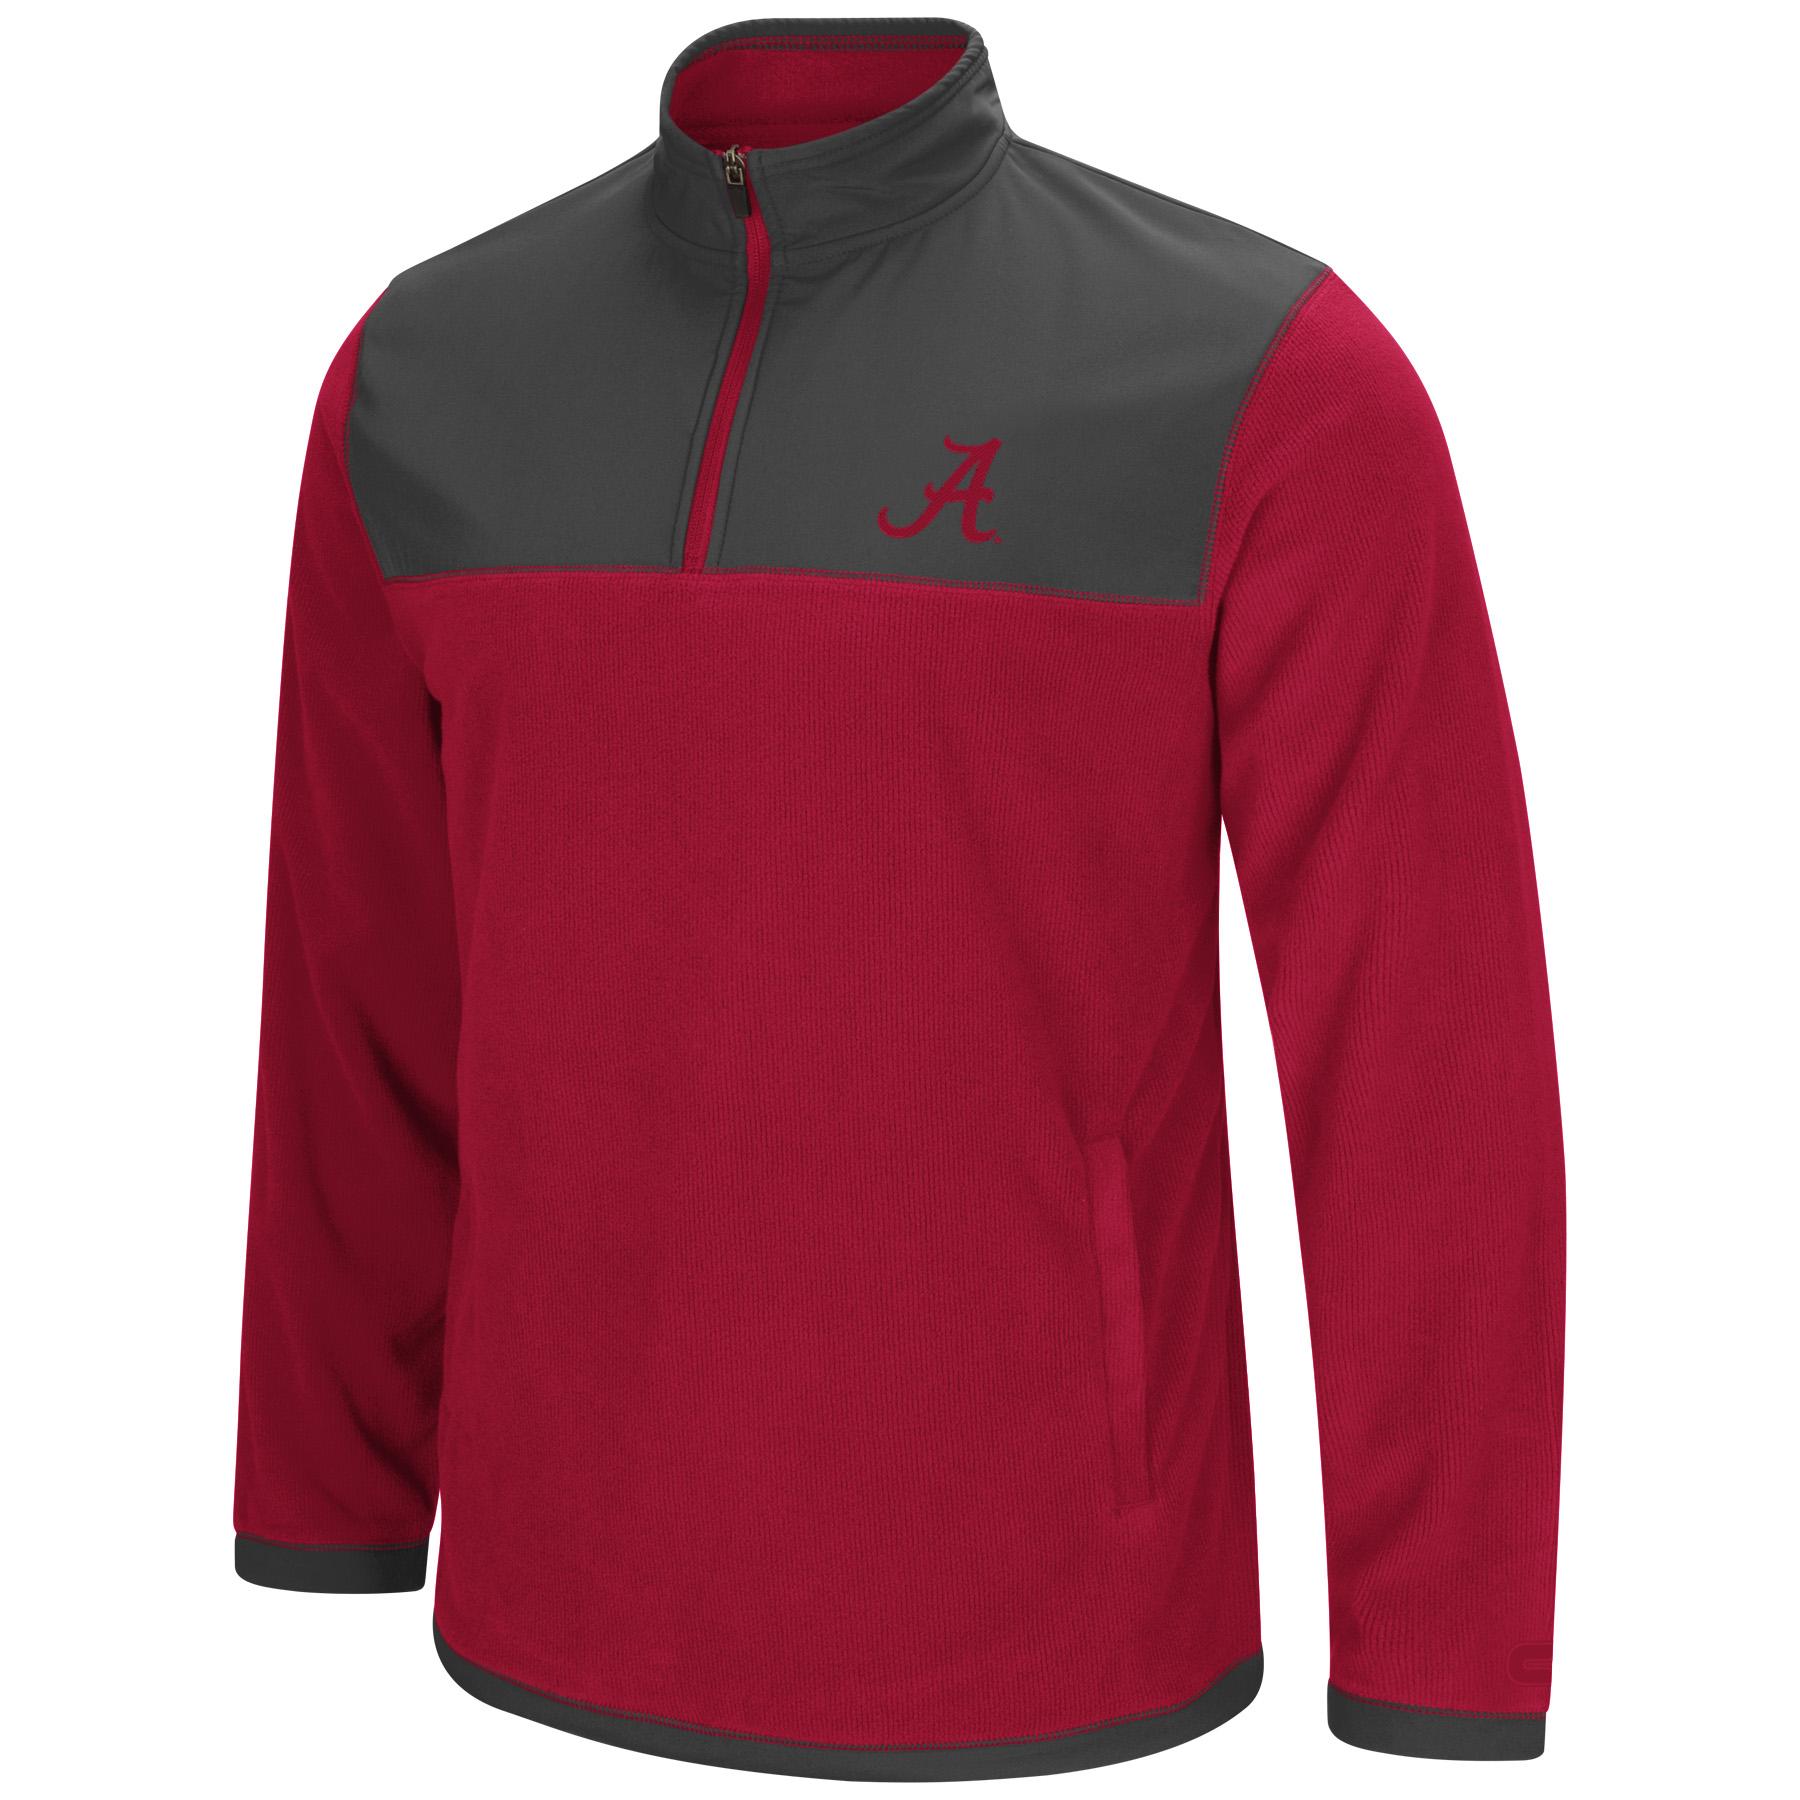 "Alabama Crimson Tide NCAA ""Blocker"" Men's 1 4 Zip Corduroy Fleece Jacket by Colosseum"